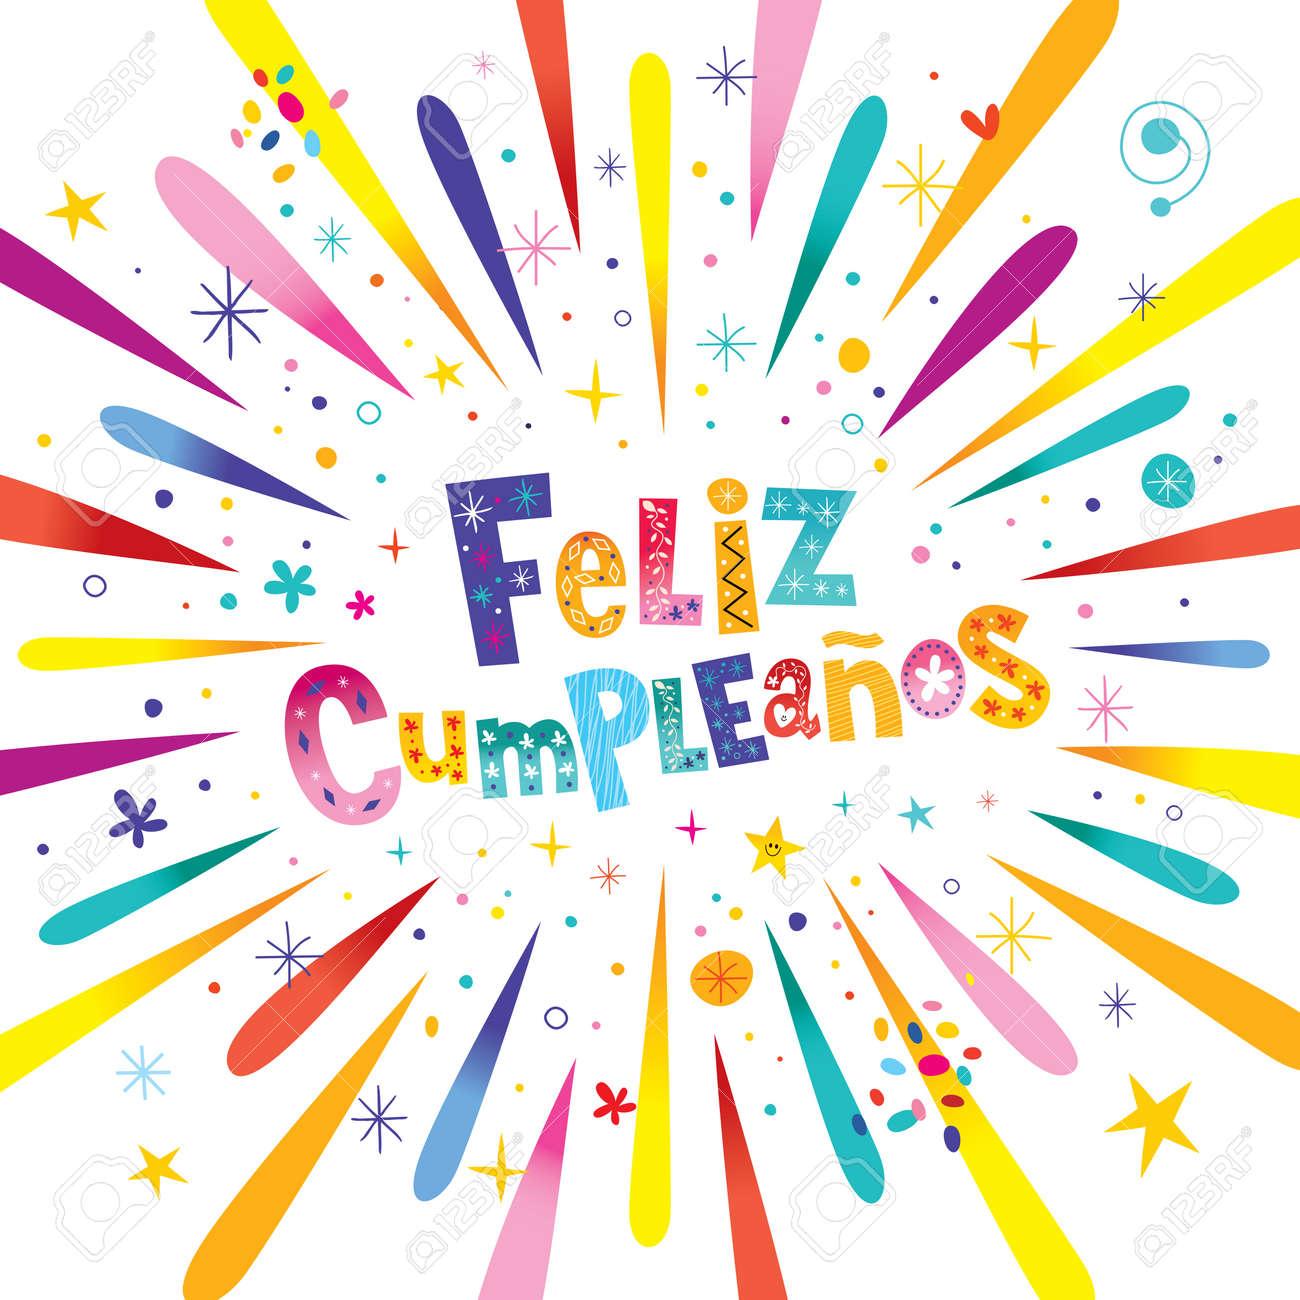 Feliz Cumpleanos - Happy Birthday In Spanish Greeting Card With..